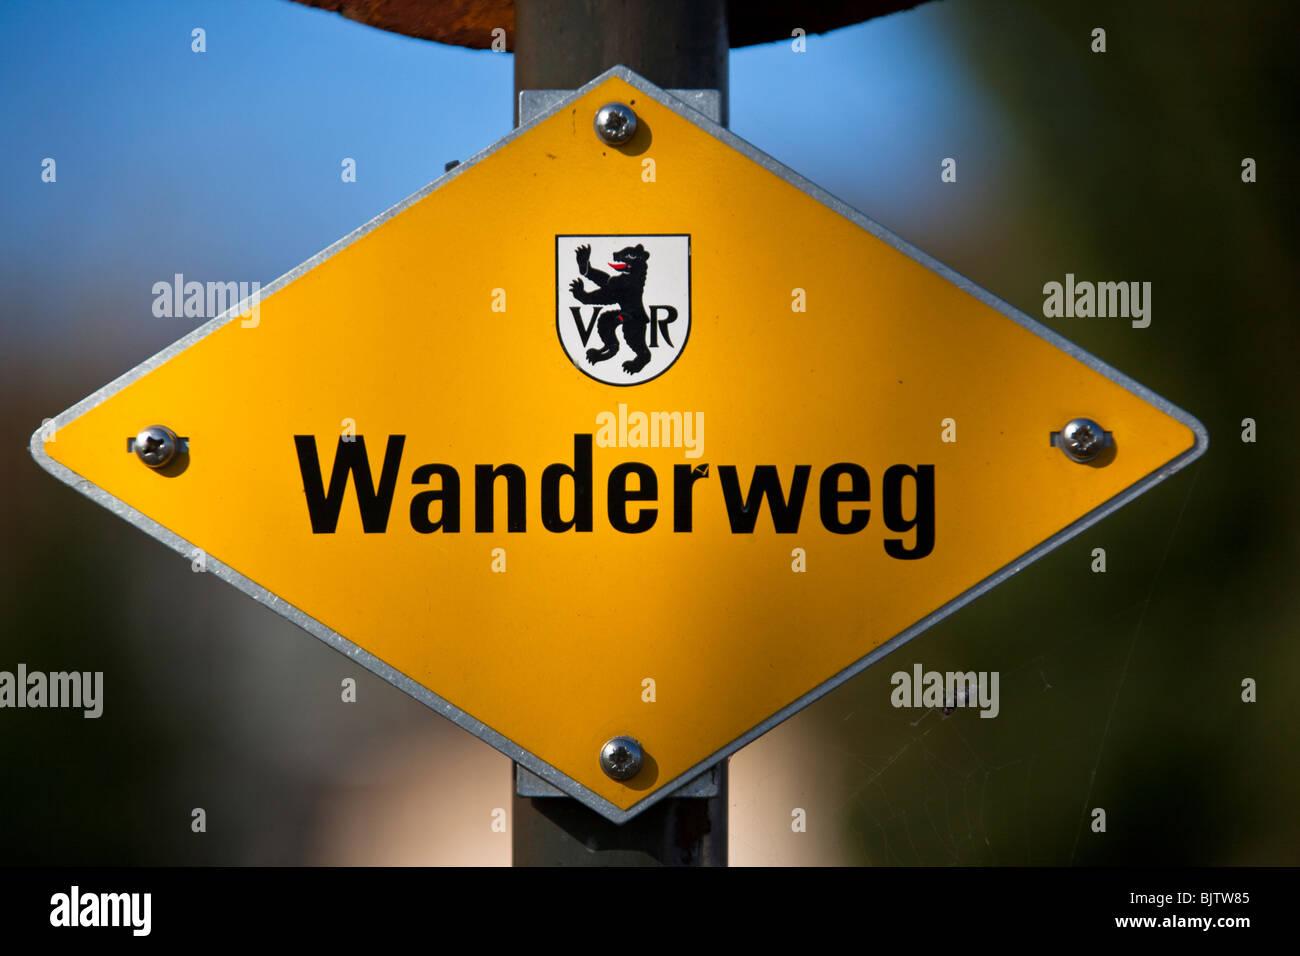 "gelb Wandern Wanderweg Schild mit dem Wappen des Kantons ""Appenzell Ausserrhoden"", Schweiz Stockbild"